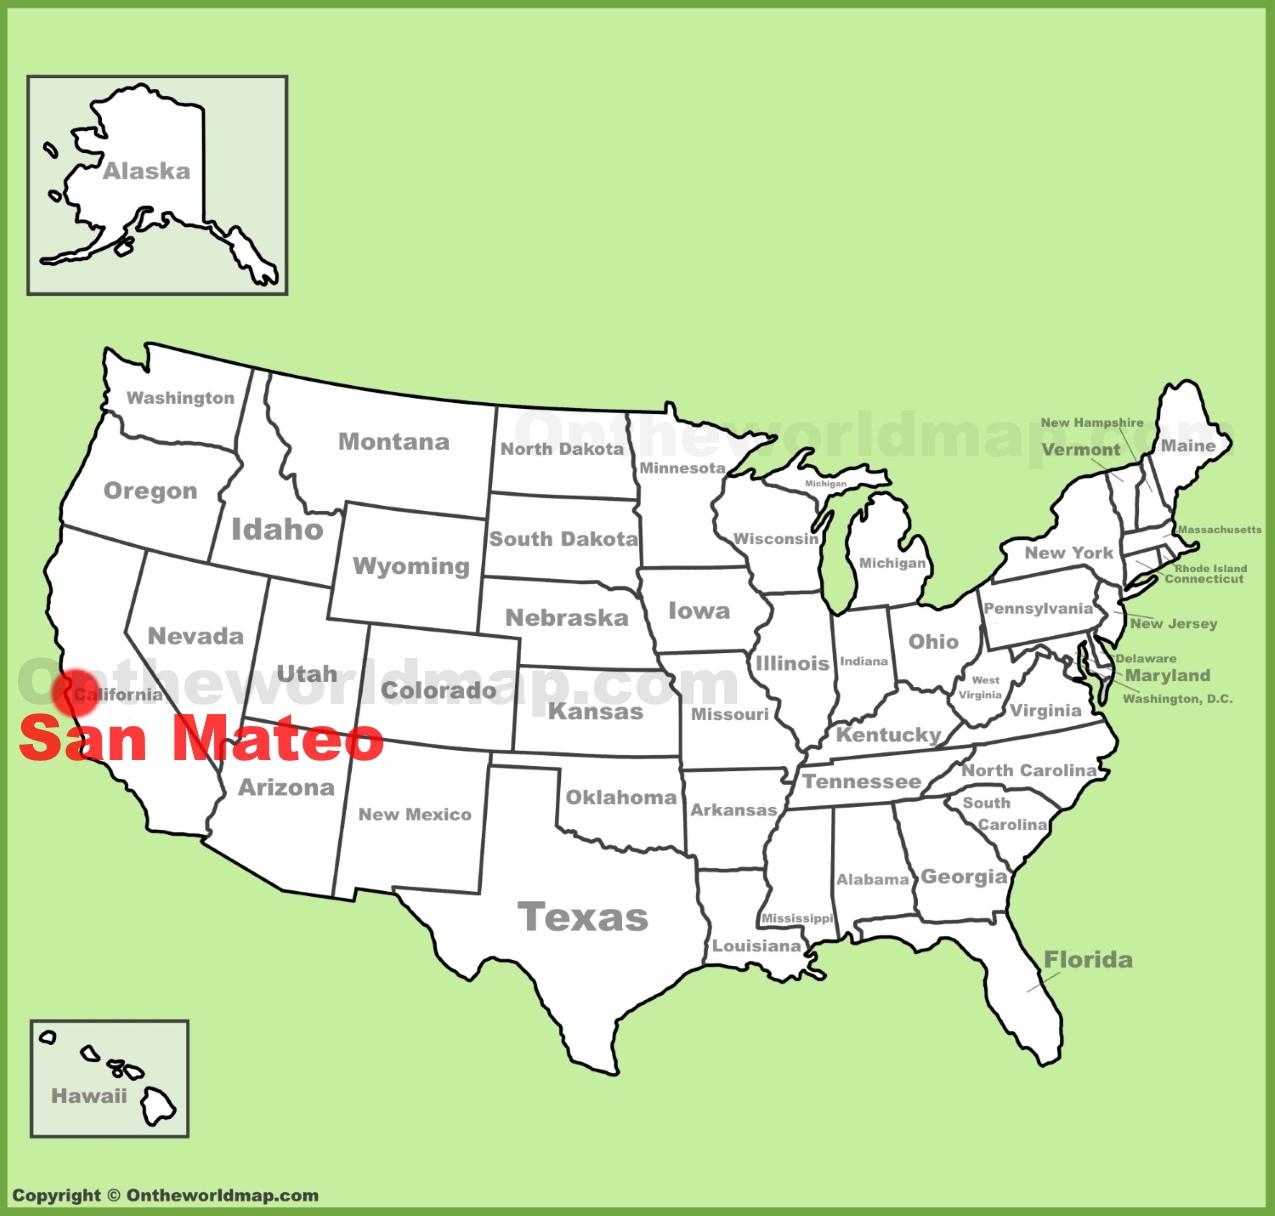 San Mateo Map San Mateo location on the U.S. Map